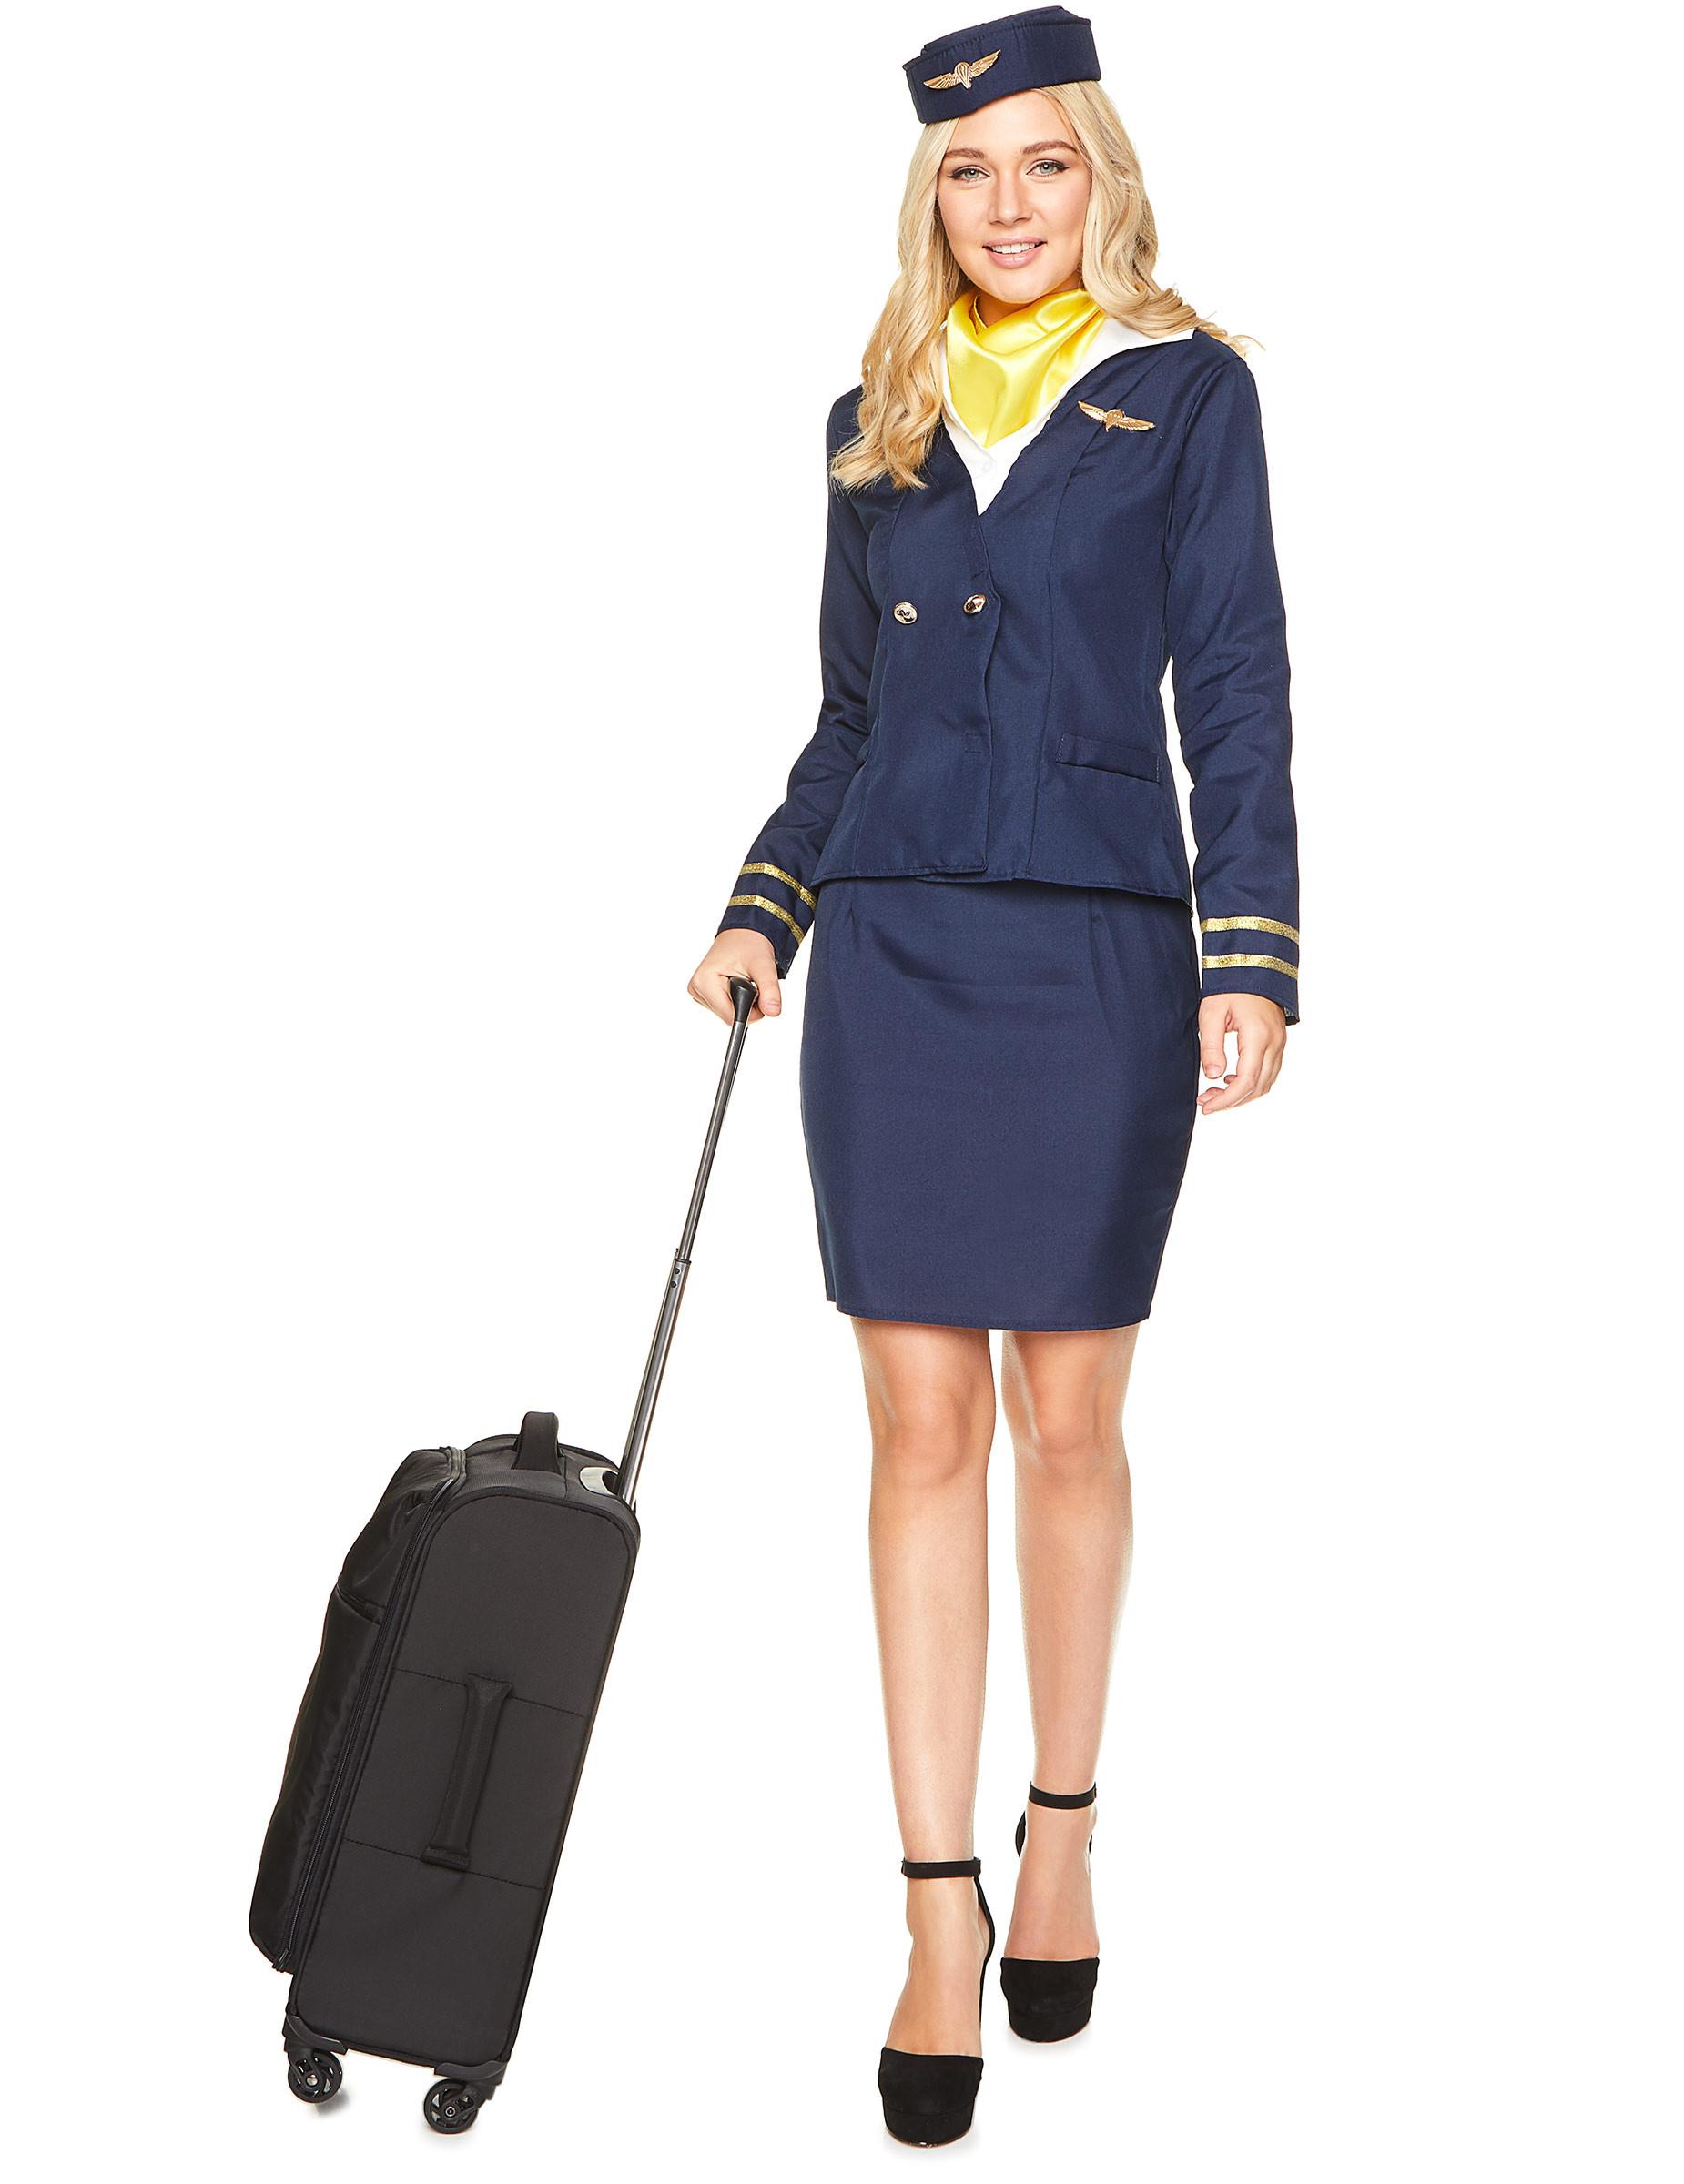 Flight Attendant Costumes DIY  Blue flight attendant costume for women Adults Costumes